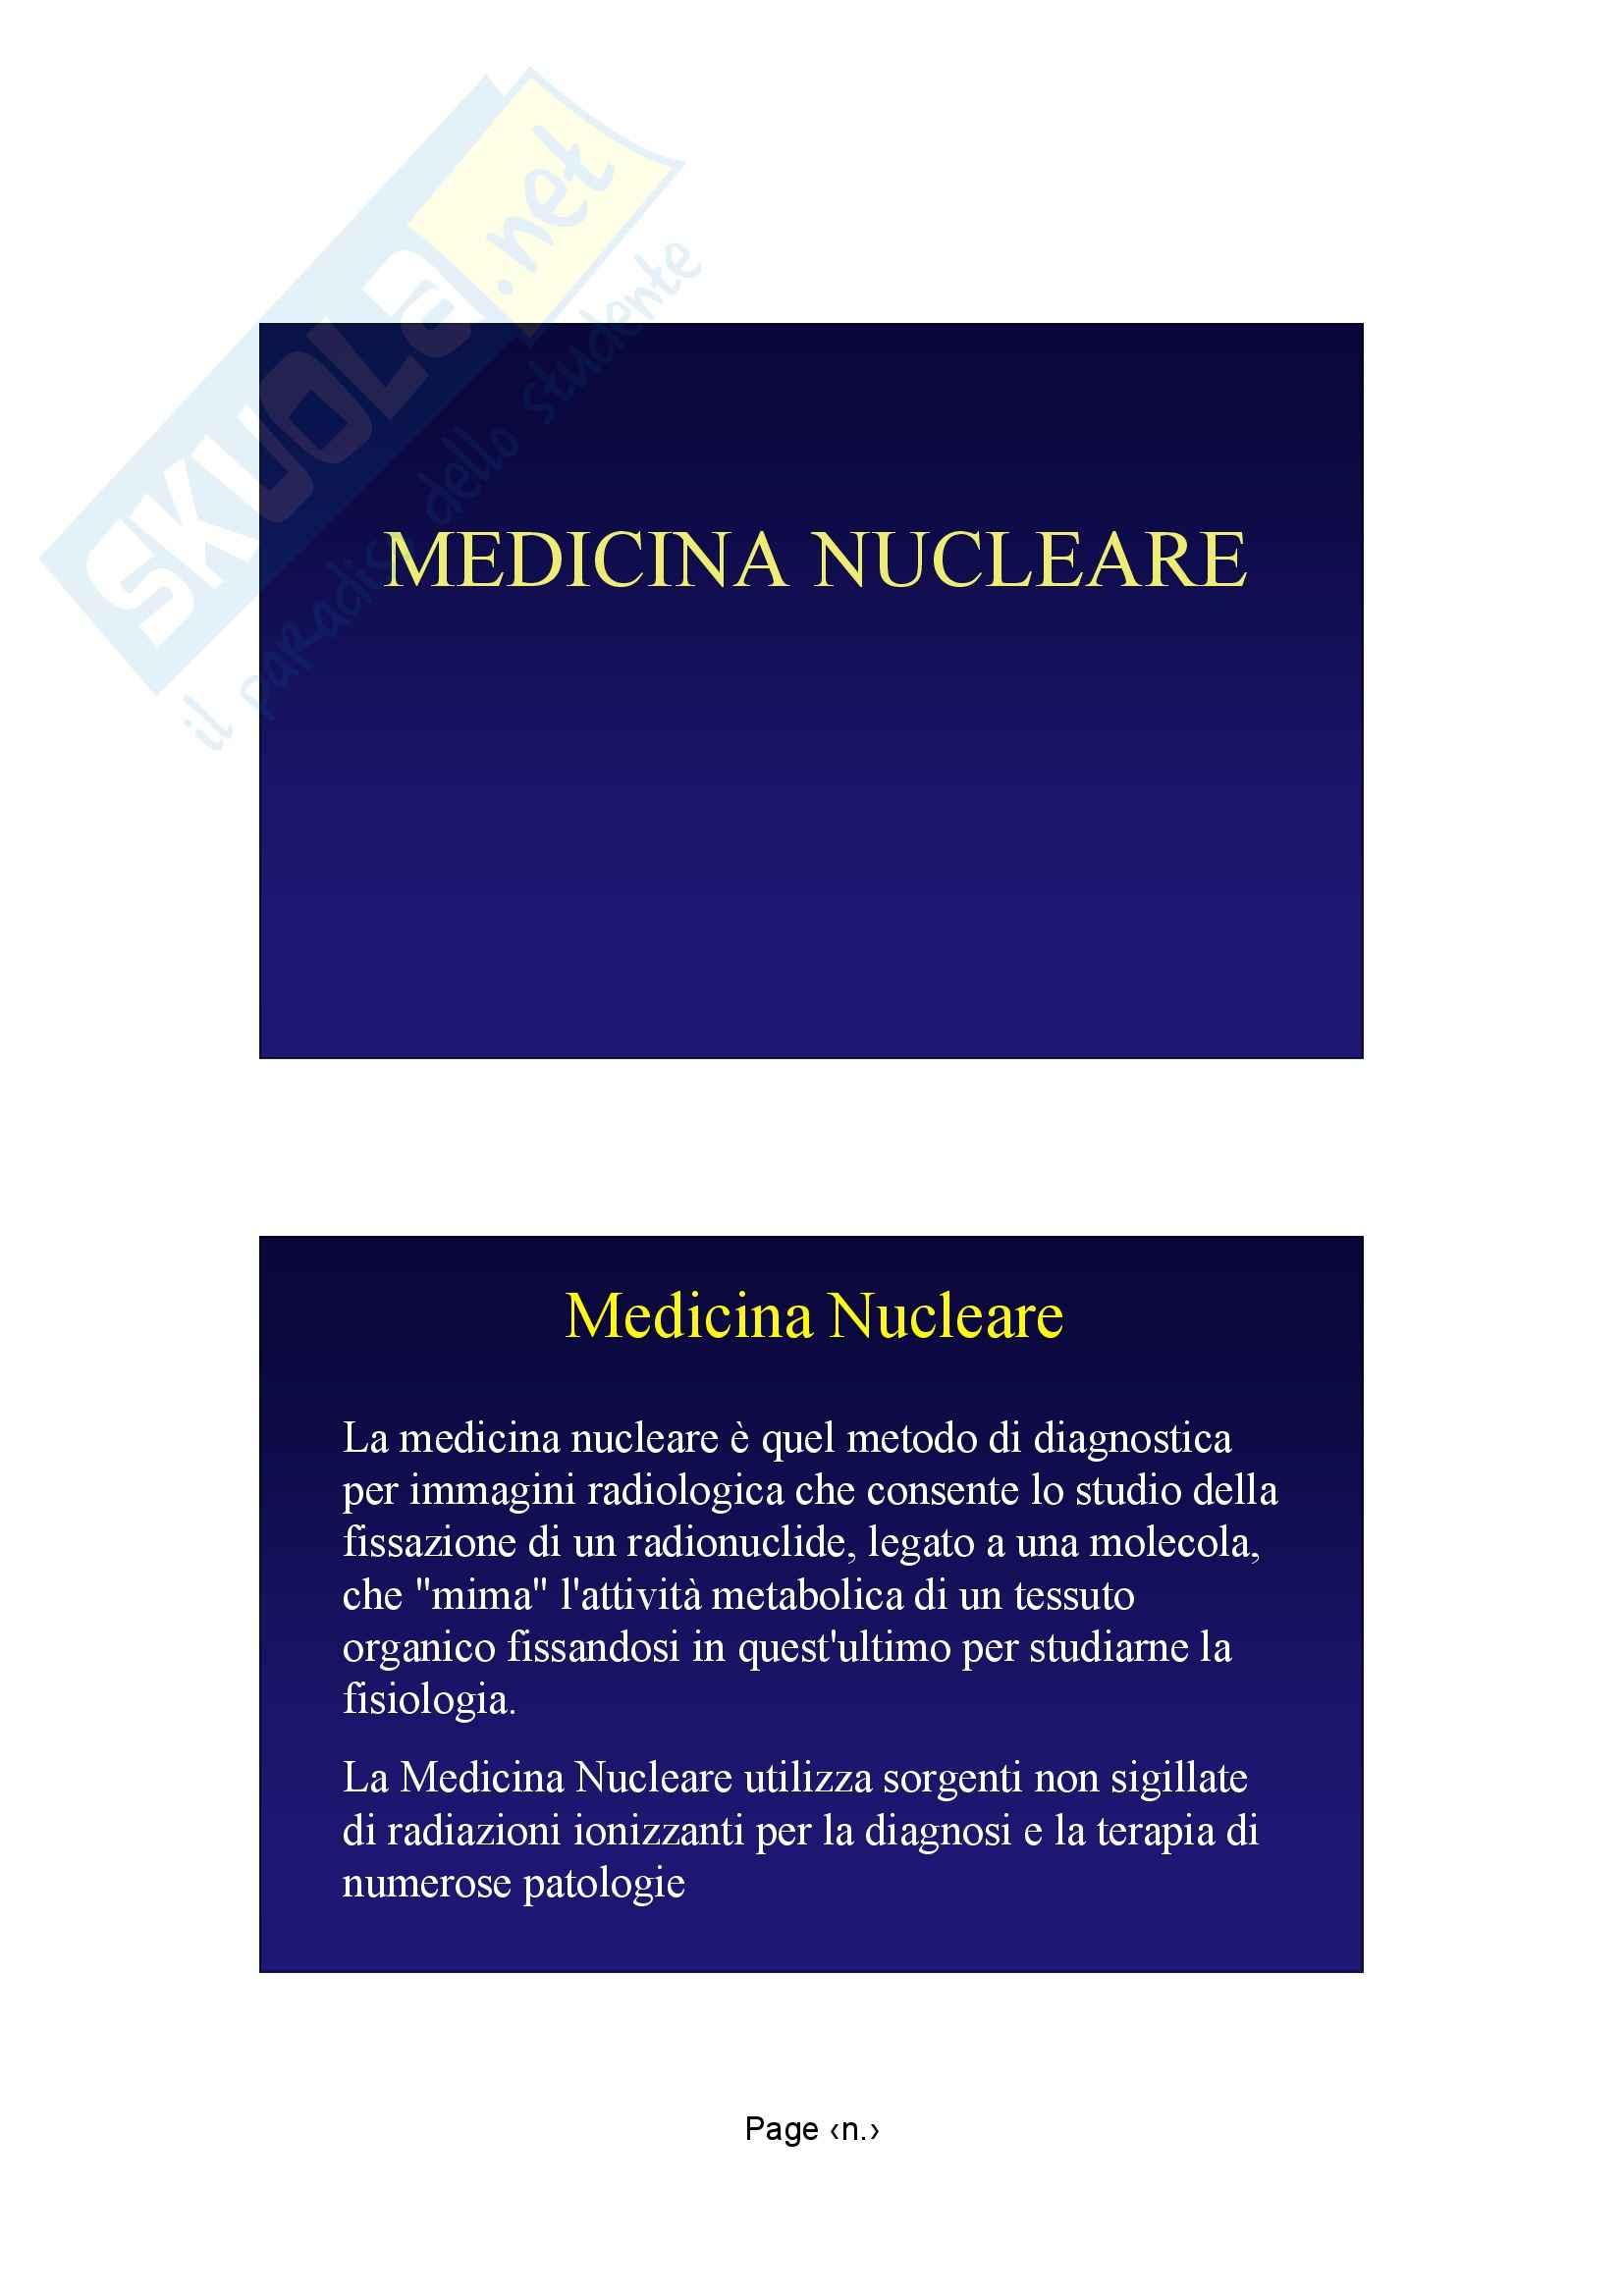 Diagnostica per immagini - Medicina nuleare